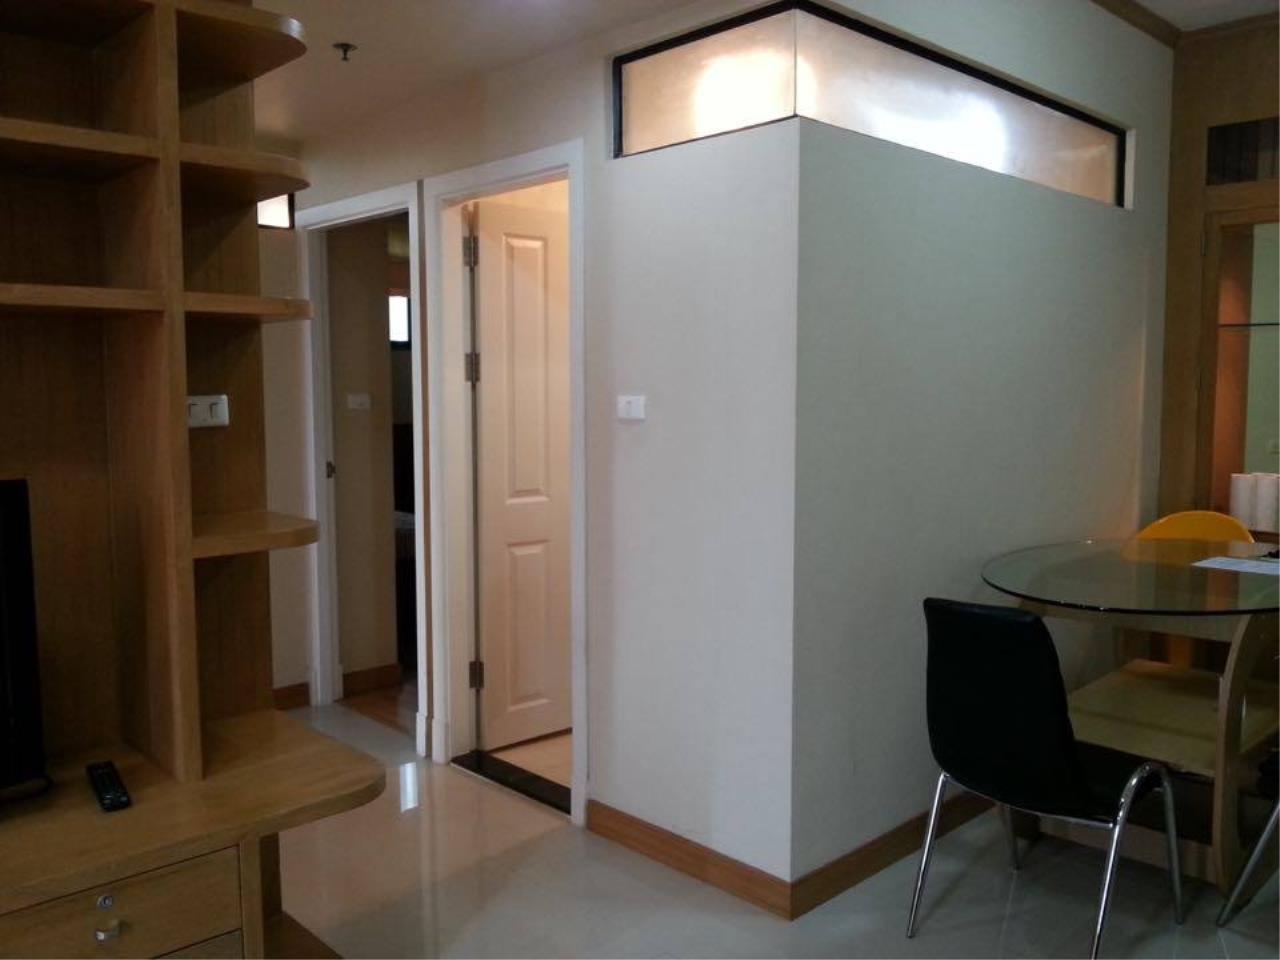 Agent - Mayteekul Sujirapinyokul Agency's AC3180418 For Rent Condo Supalai Premier Place Asoke Condo MRT Phetchaburi 5